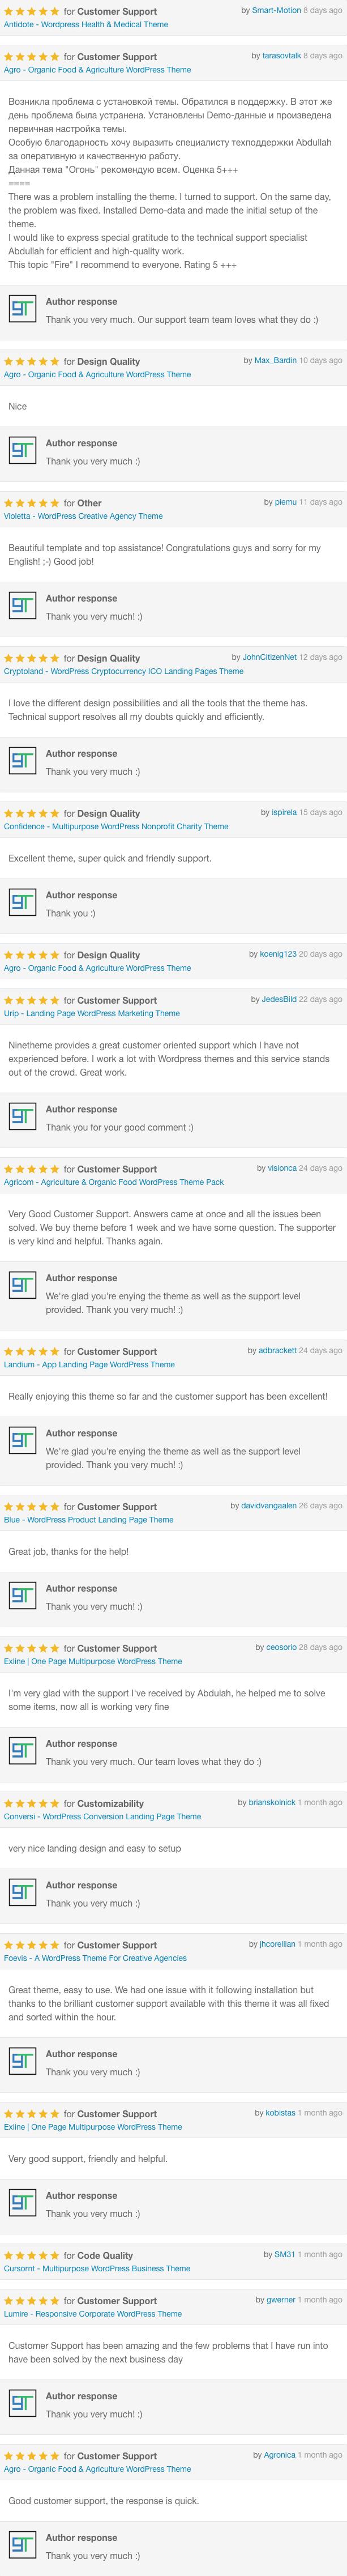 customer reviews - Techland - Saas Startup Technology Marketing Agency WordPress Theme